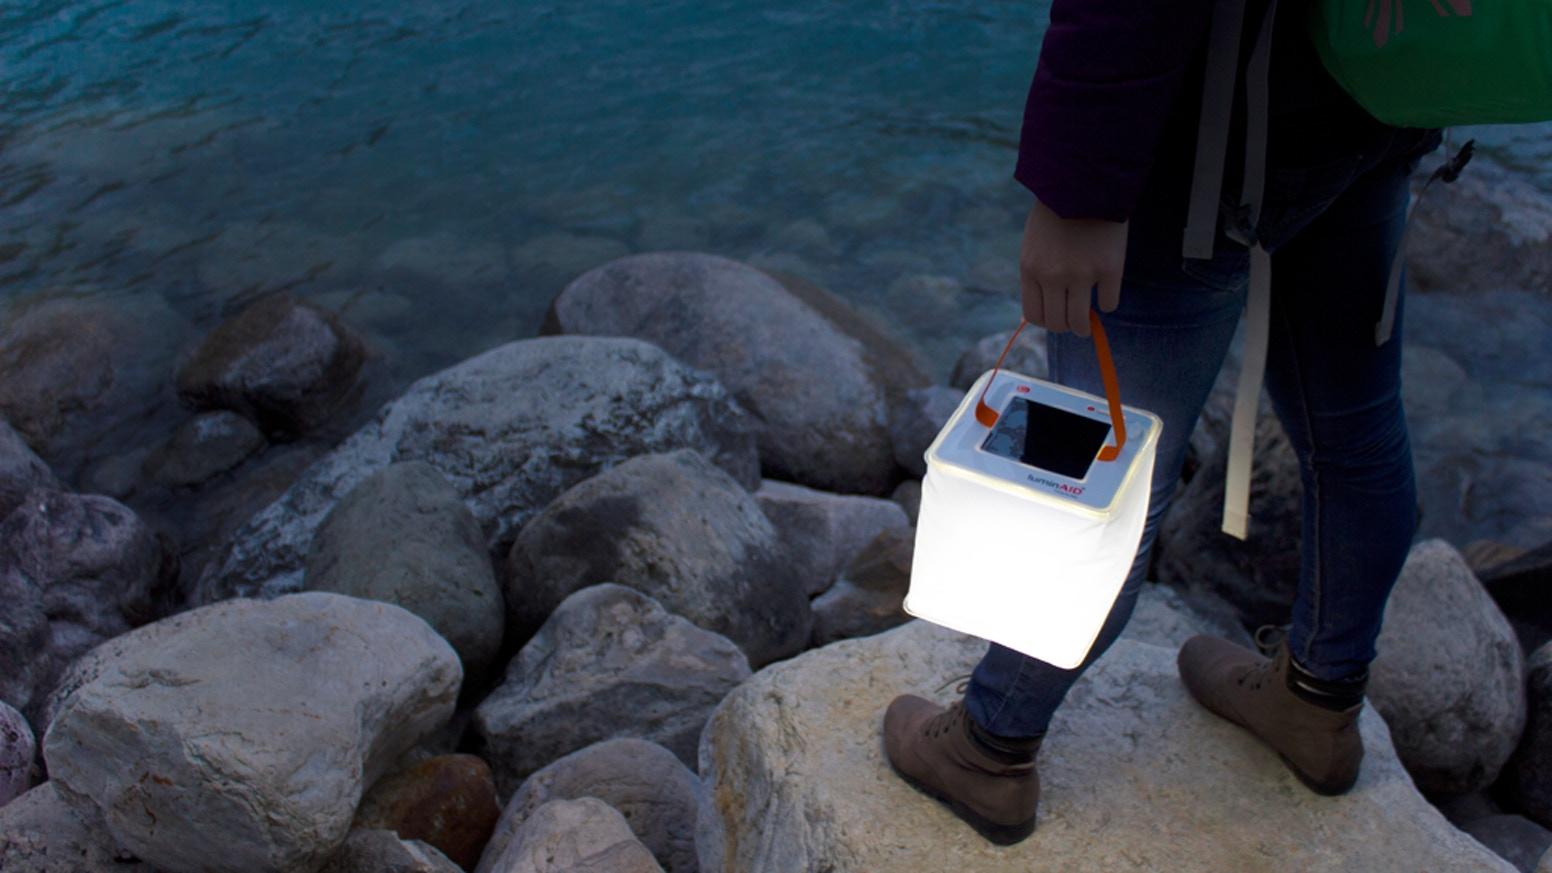 Best Solar Camping Lanterns to Buy Online